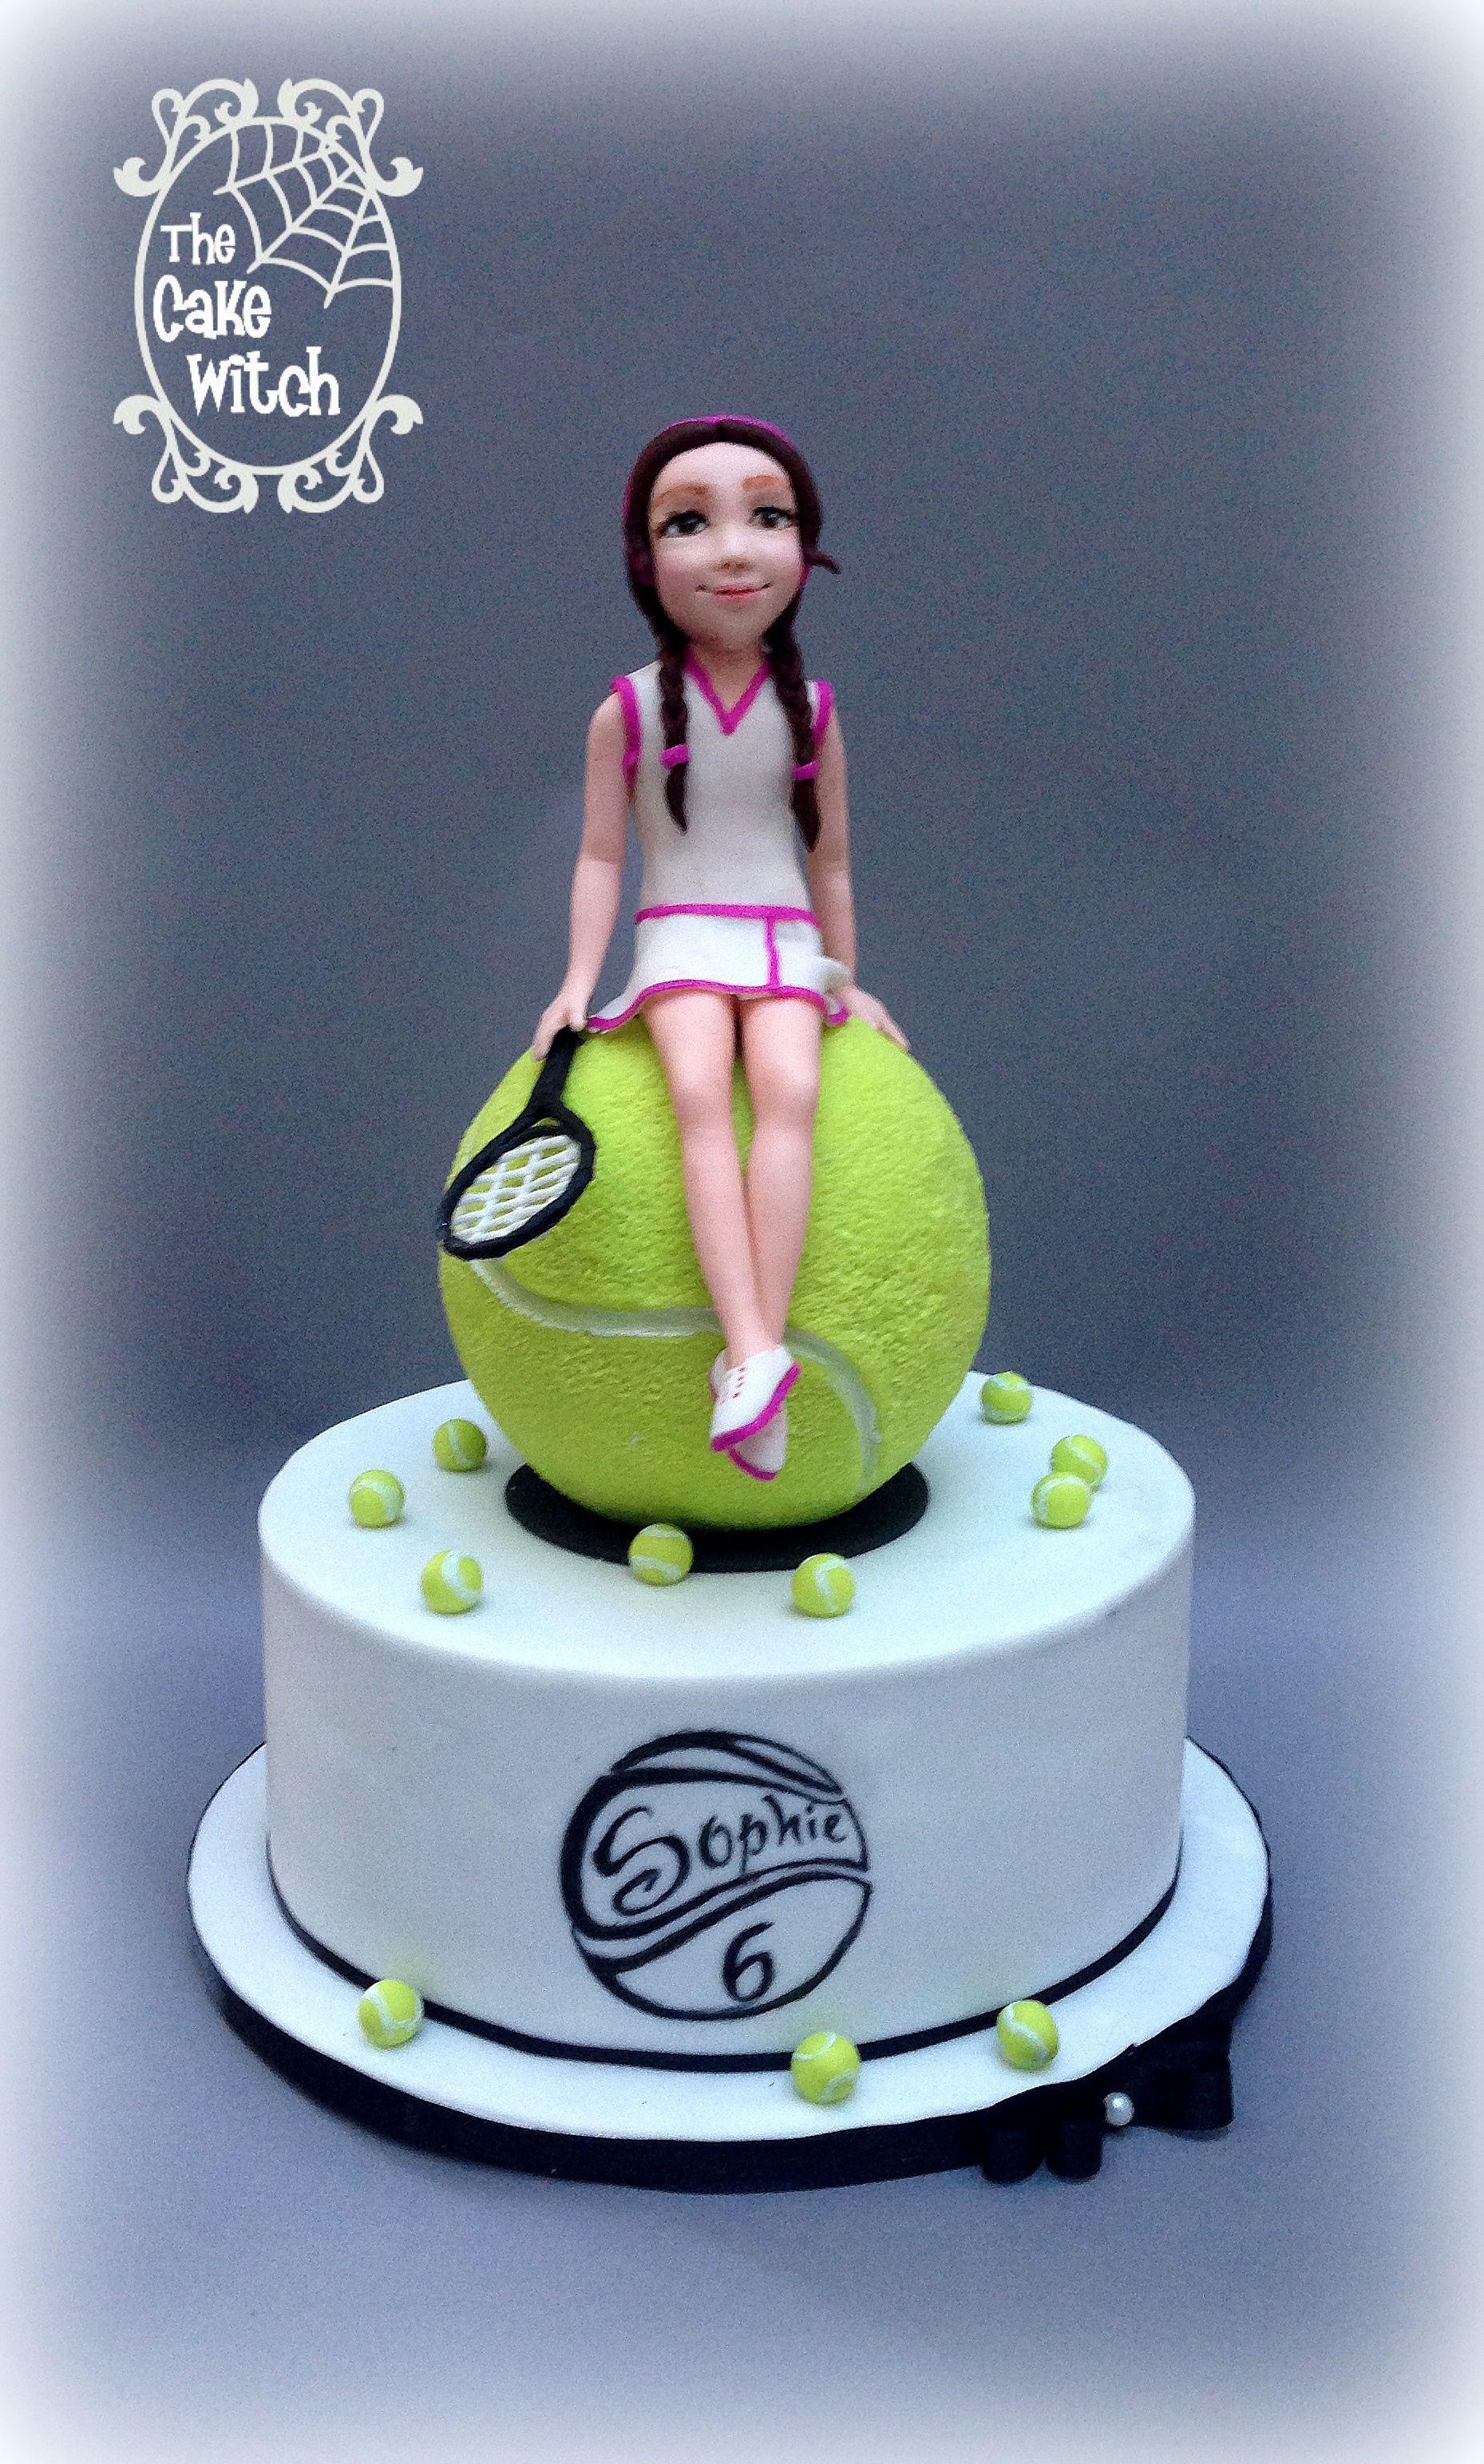 Enjoyable Tennis Birthday Cake Tennis Ball Rkt Tennis Player Girl Funny Birthday Cards Online Alyptdamsfinfo